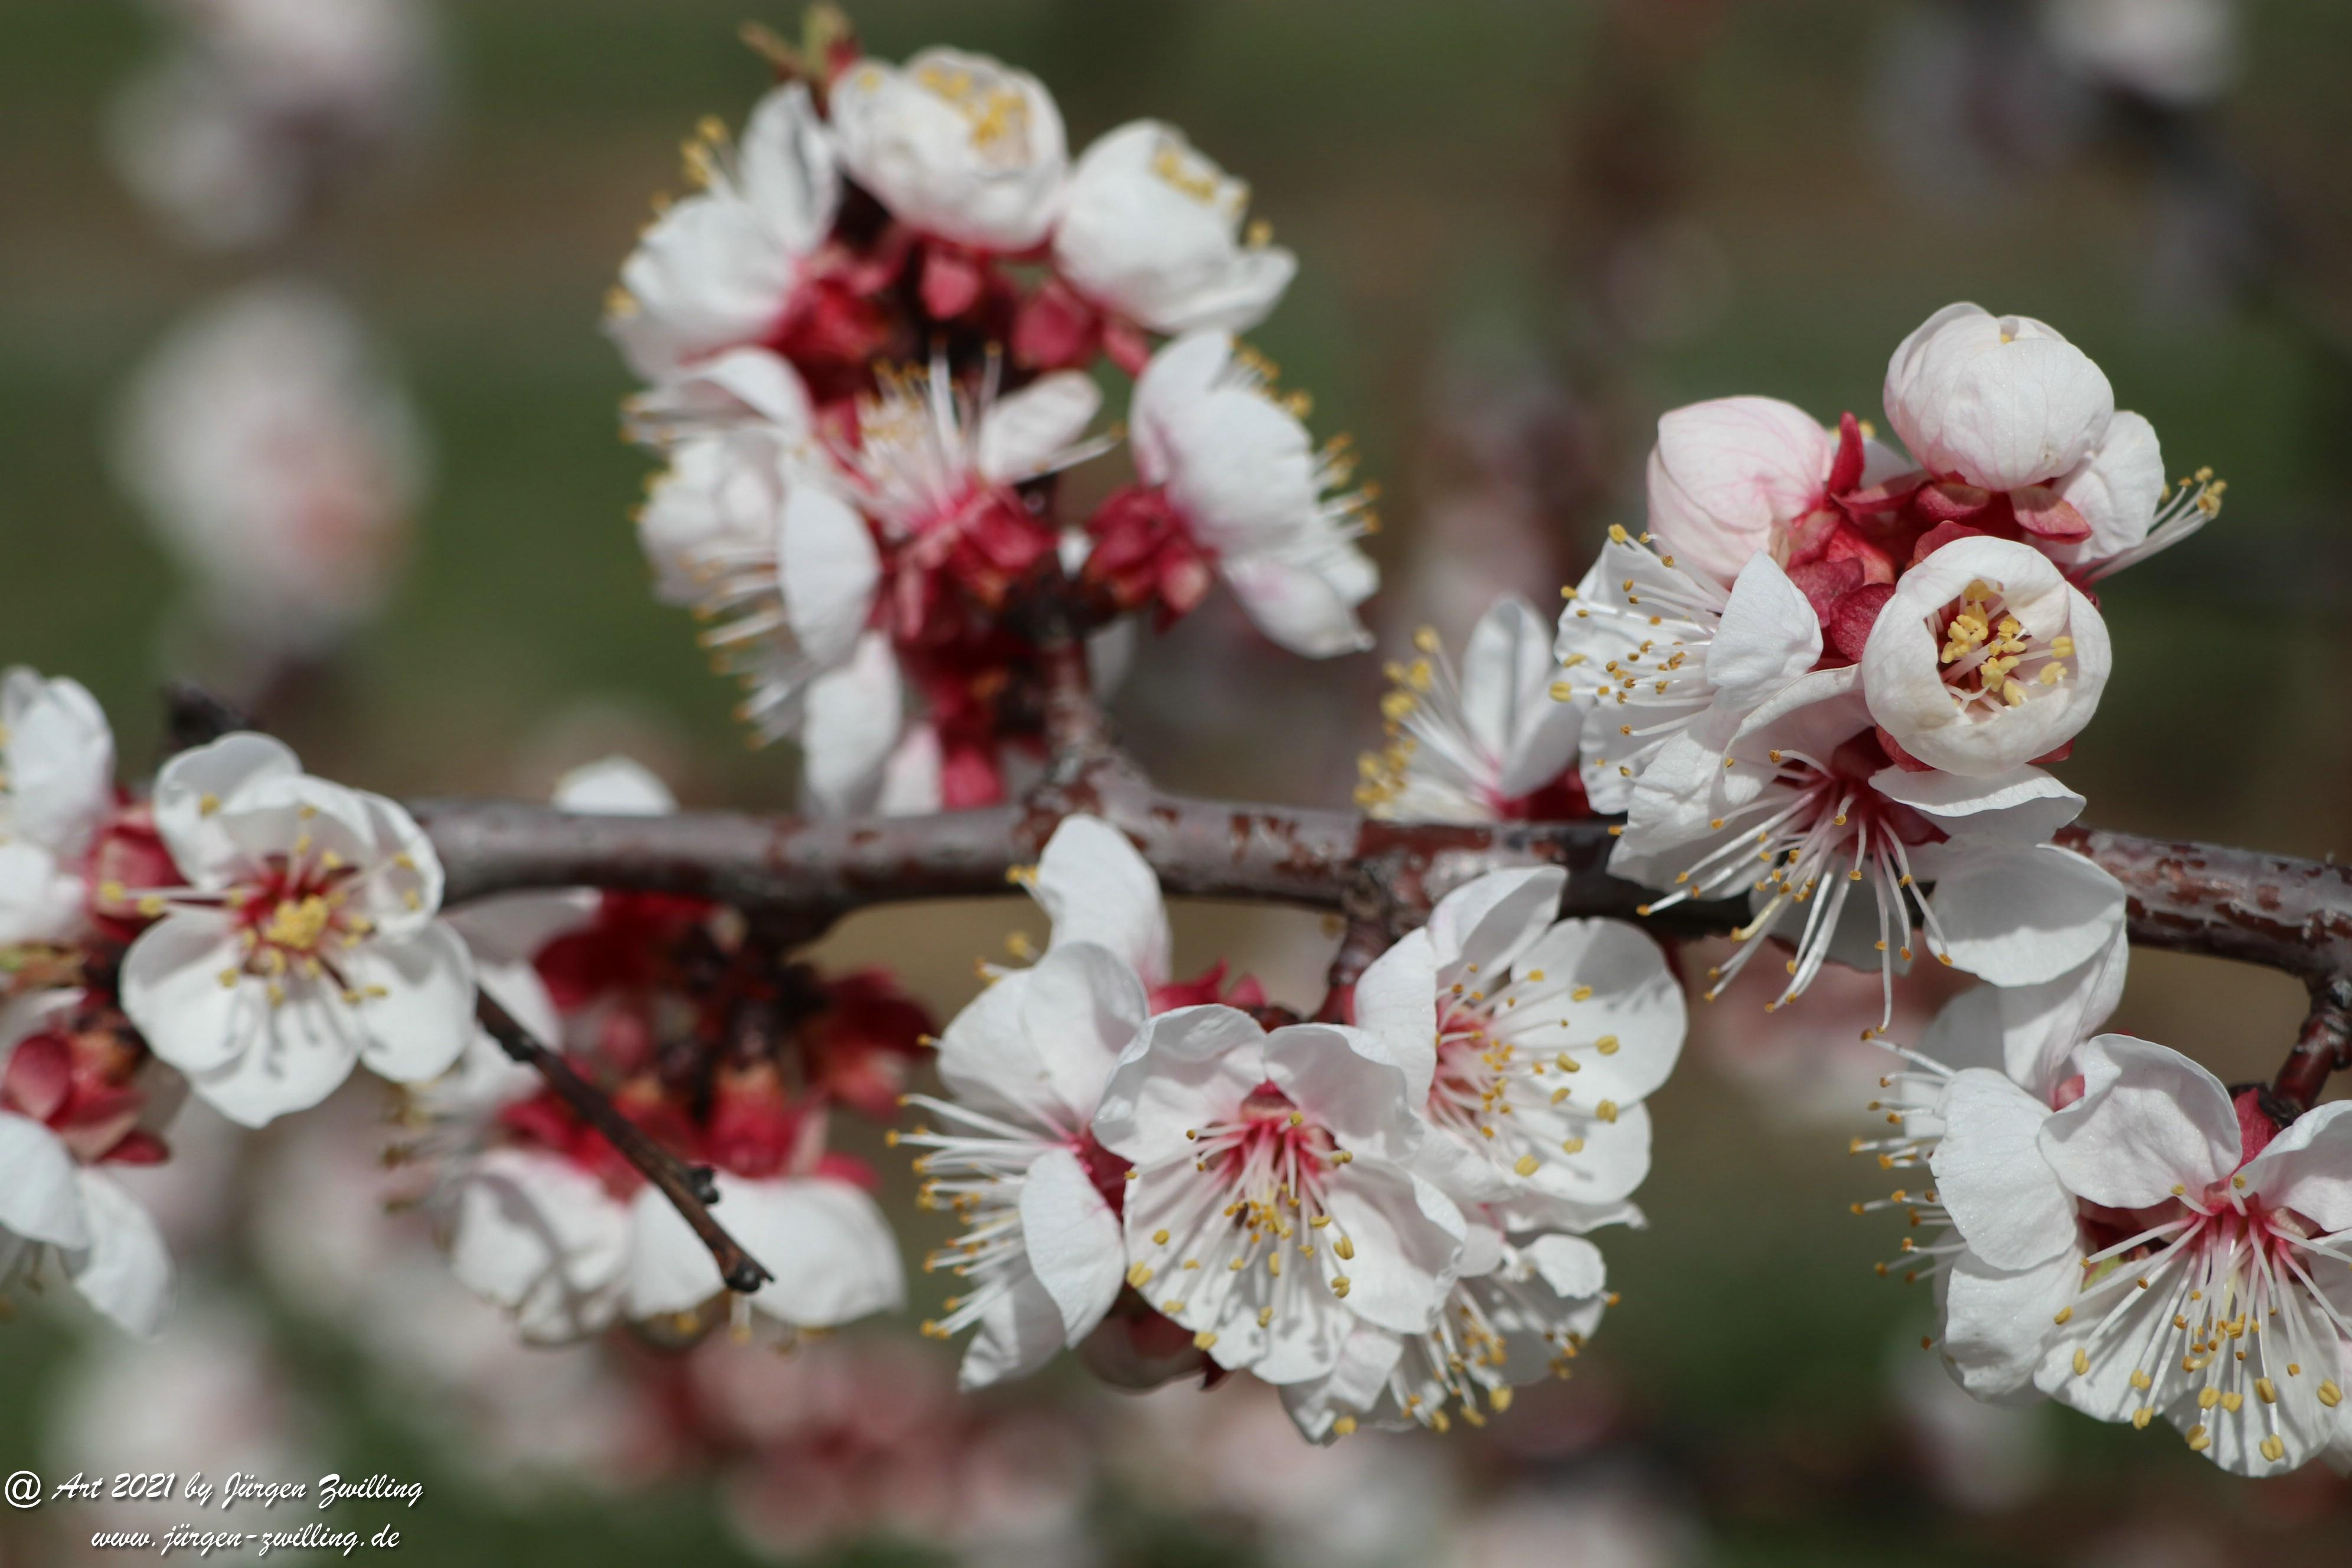 Aprikosenblüte 21